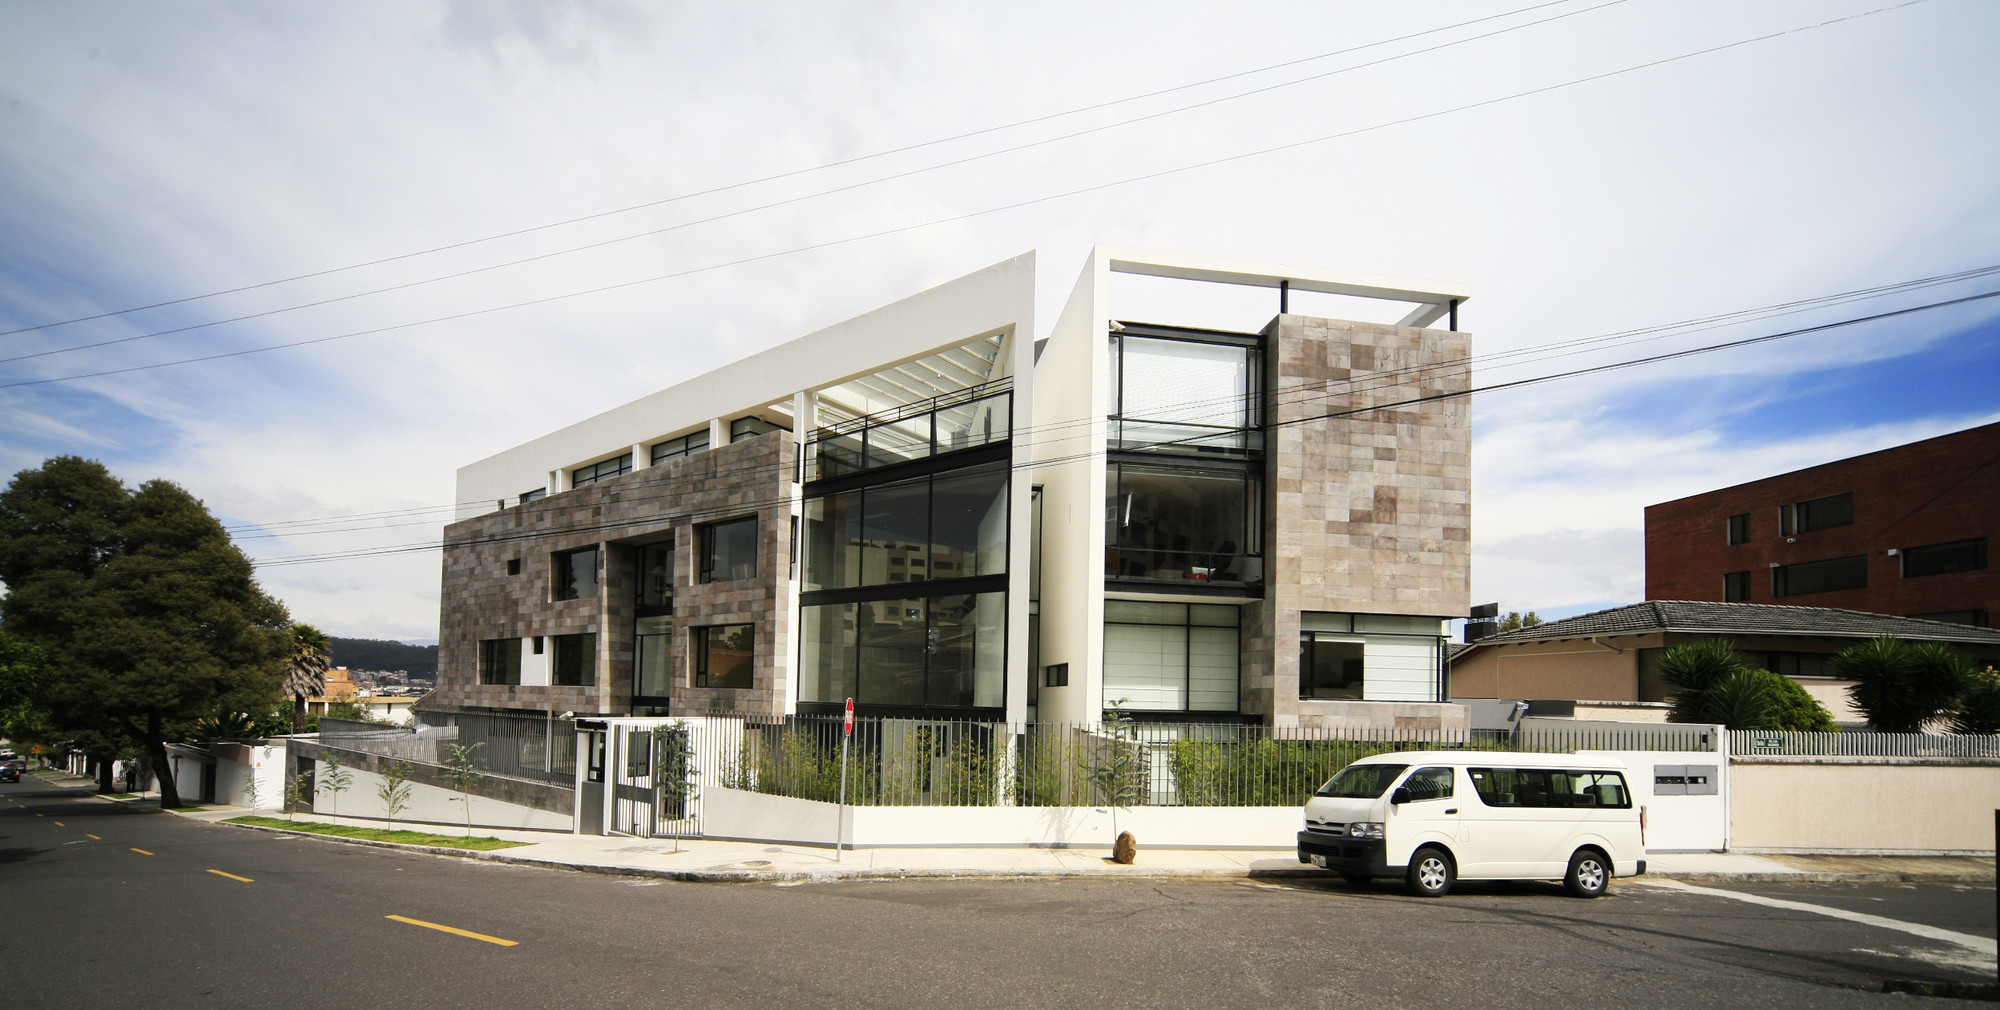 Edificio mz diez muller arquitectos archdaily colombia for Plataforma arquitectura